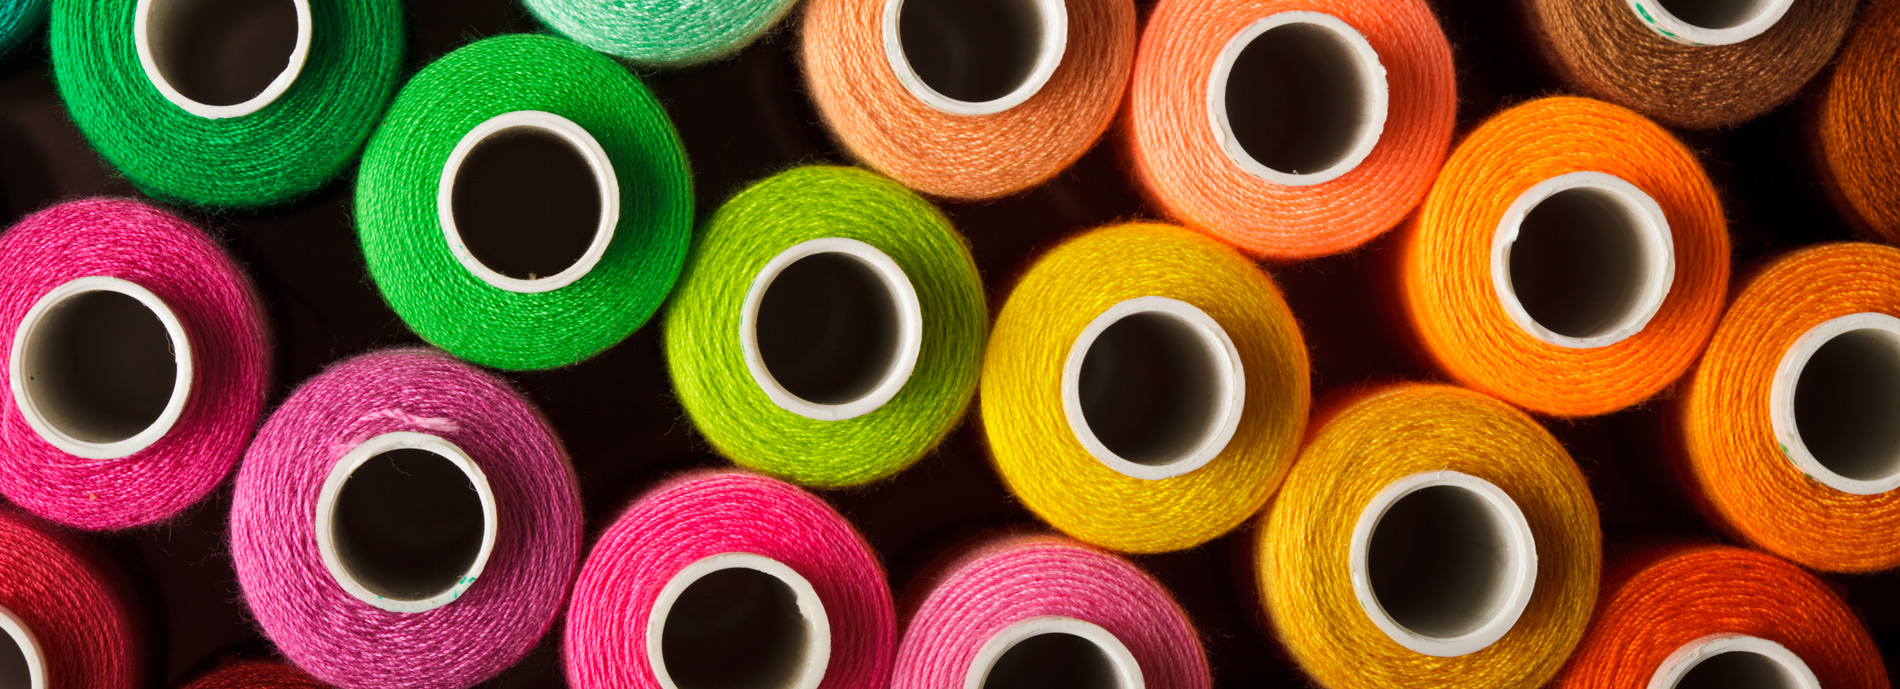 HND in Art & Design Textile